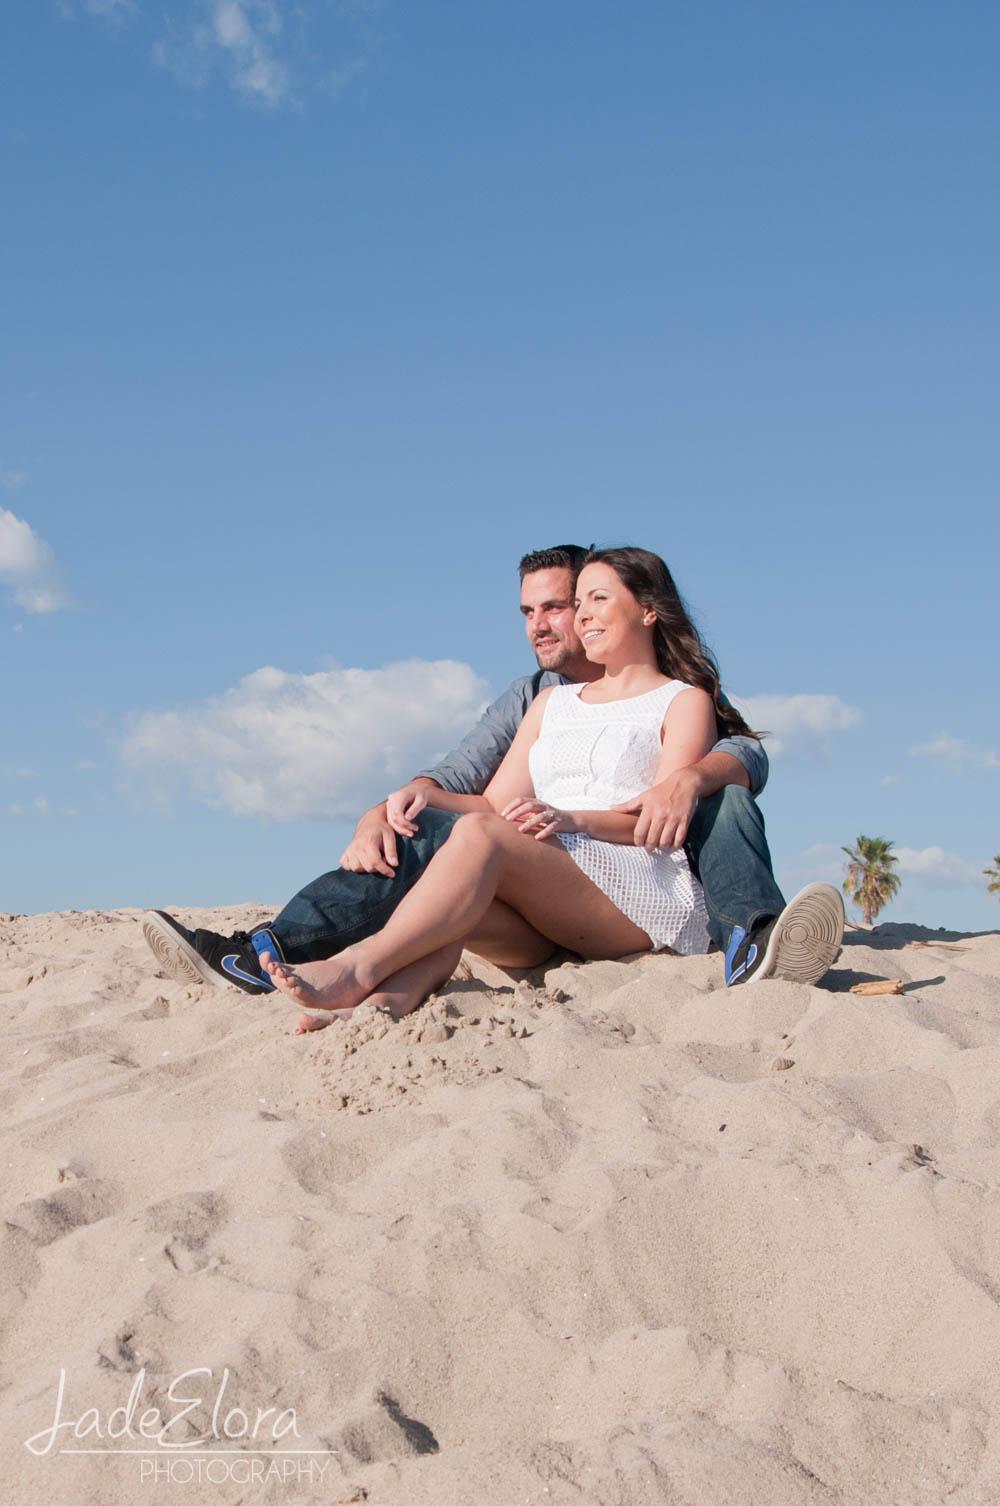 JadeEloraPhotography-Engagement-Wedding-Blog-4.jpg